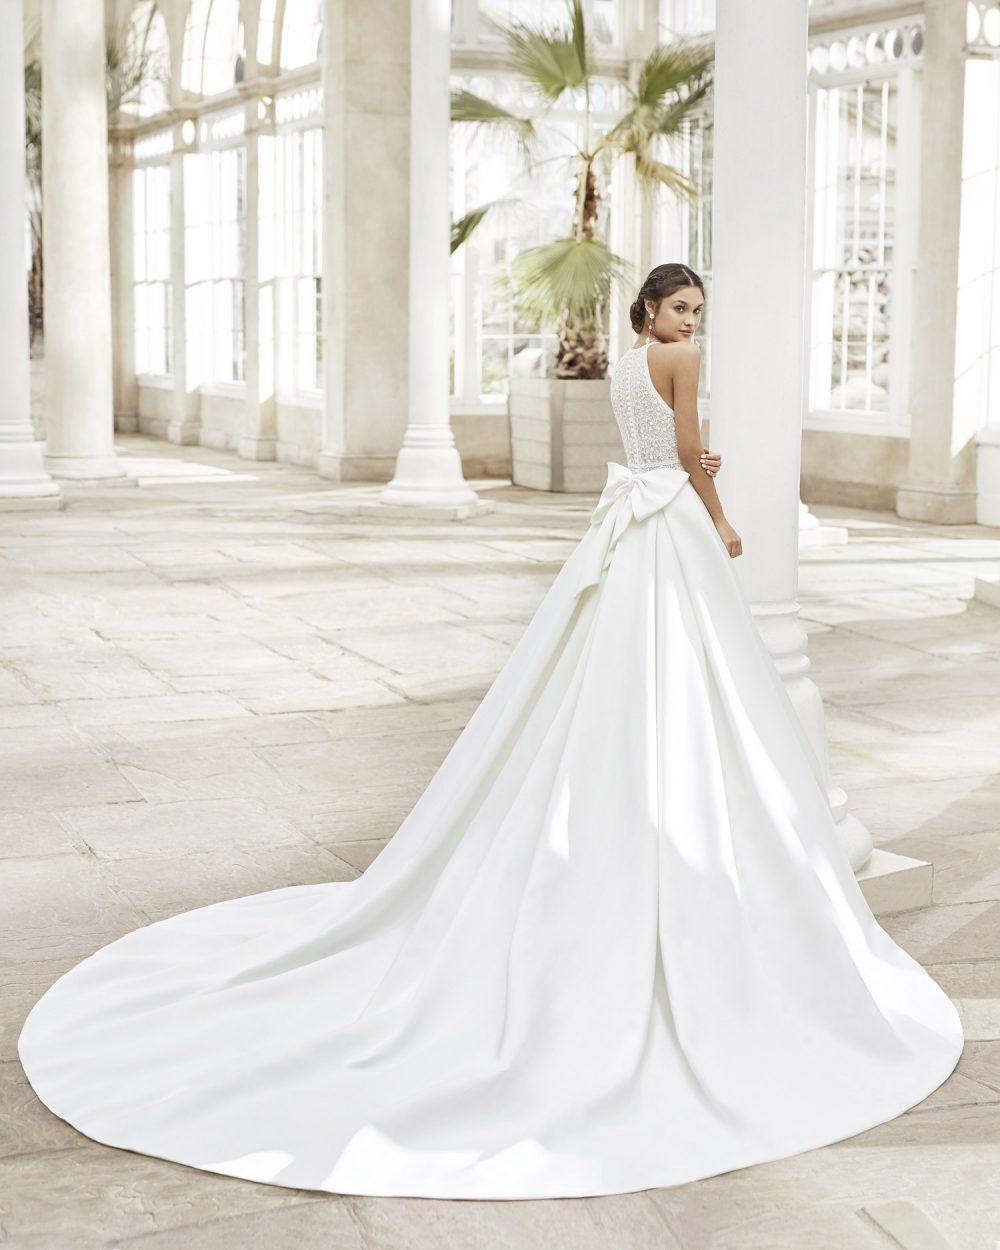 Mariages: abito da sposa Rosa Clarà 2021 a Vicenza, Verona, Padova, Veneto 5A178 TYSAR